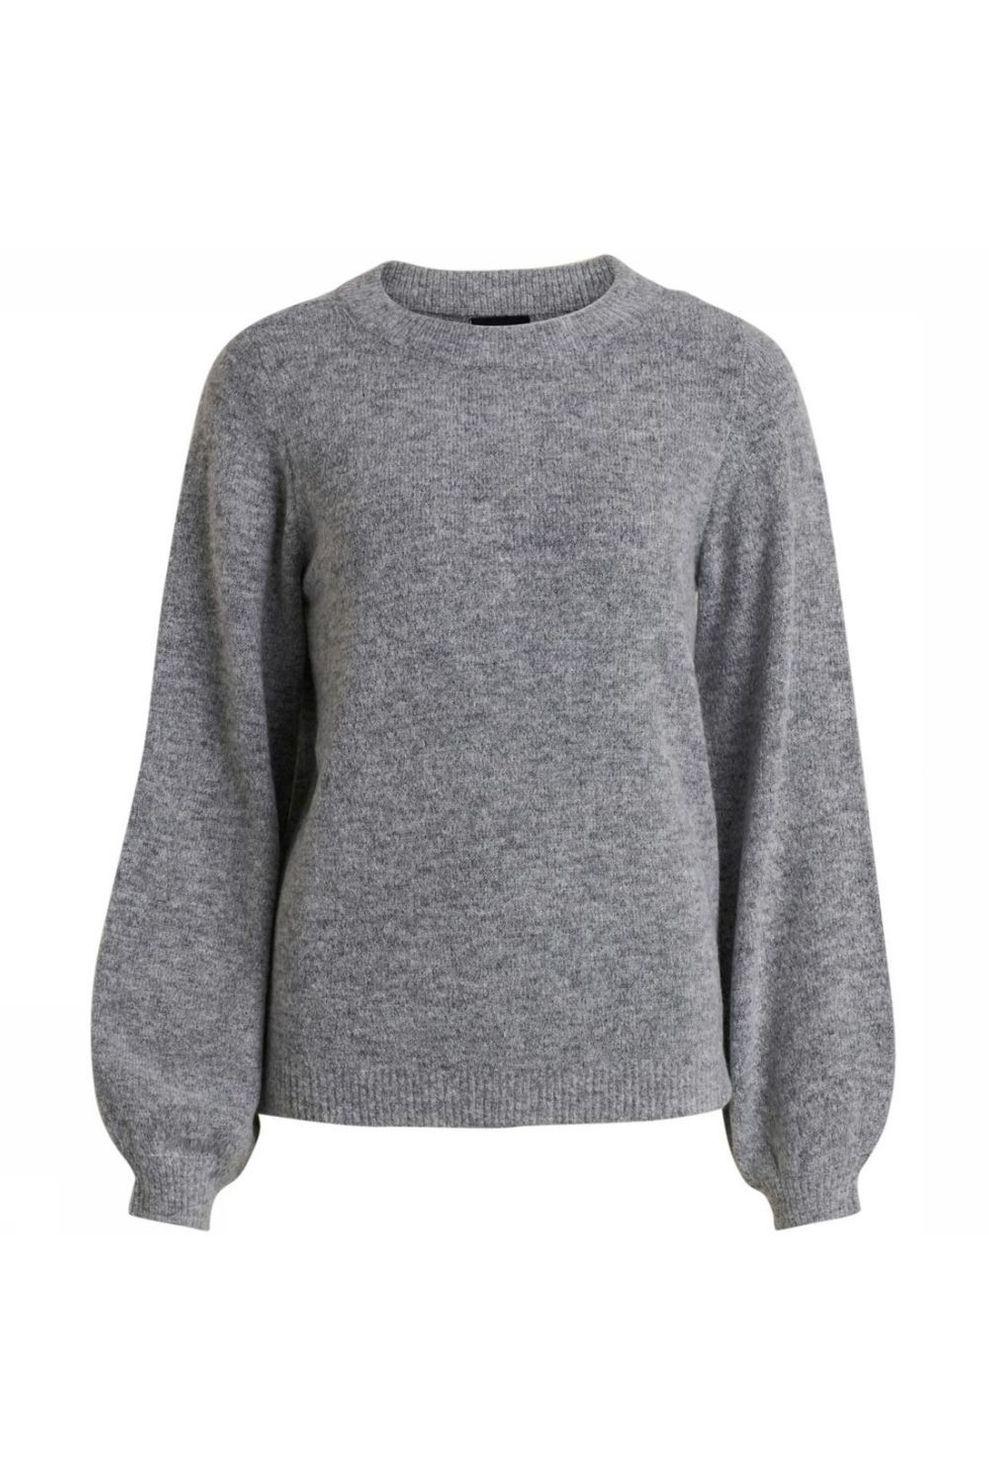 Object Trui Eve Nonsia Ls Knit voor dames - Grijs Mengeling - Maten: XS, M, L, XL